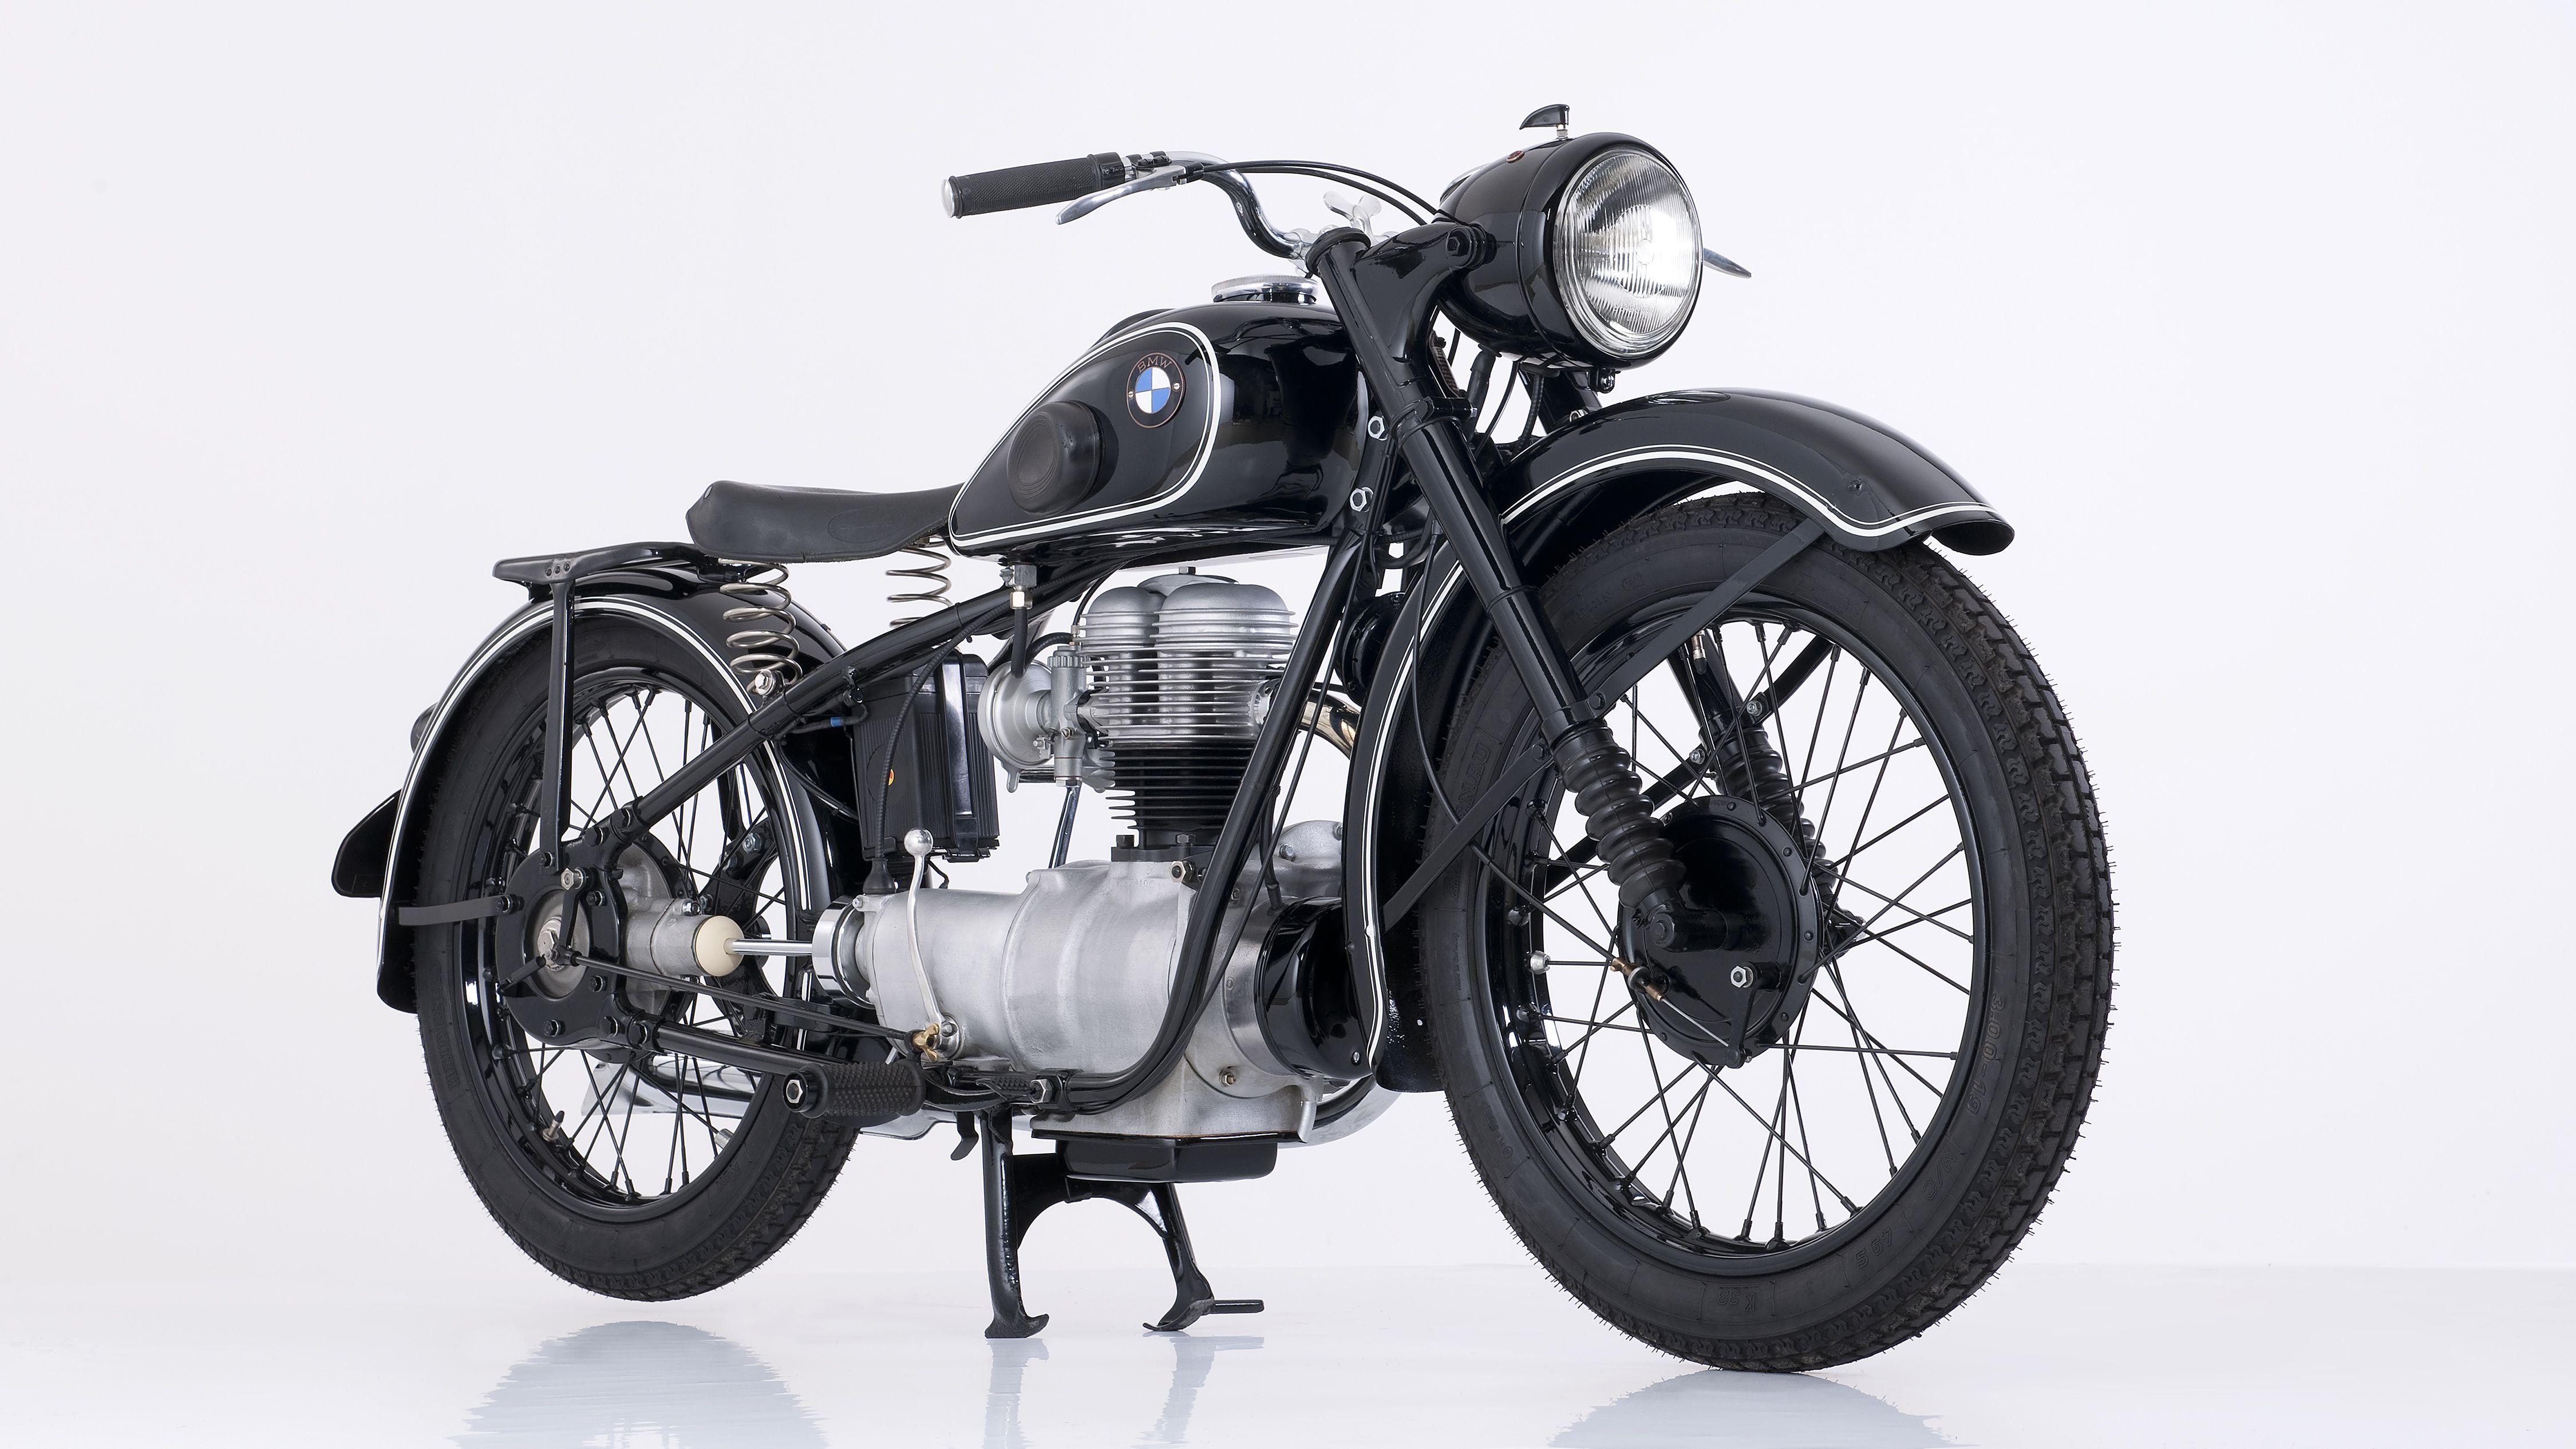 Bmw motorcycles milestones 90 years of